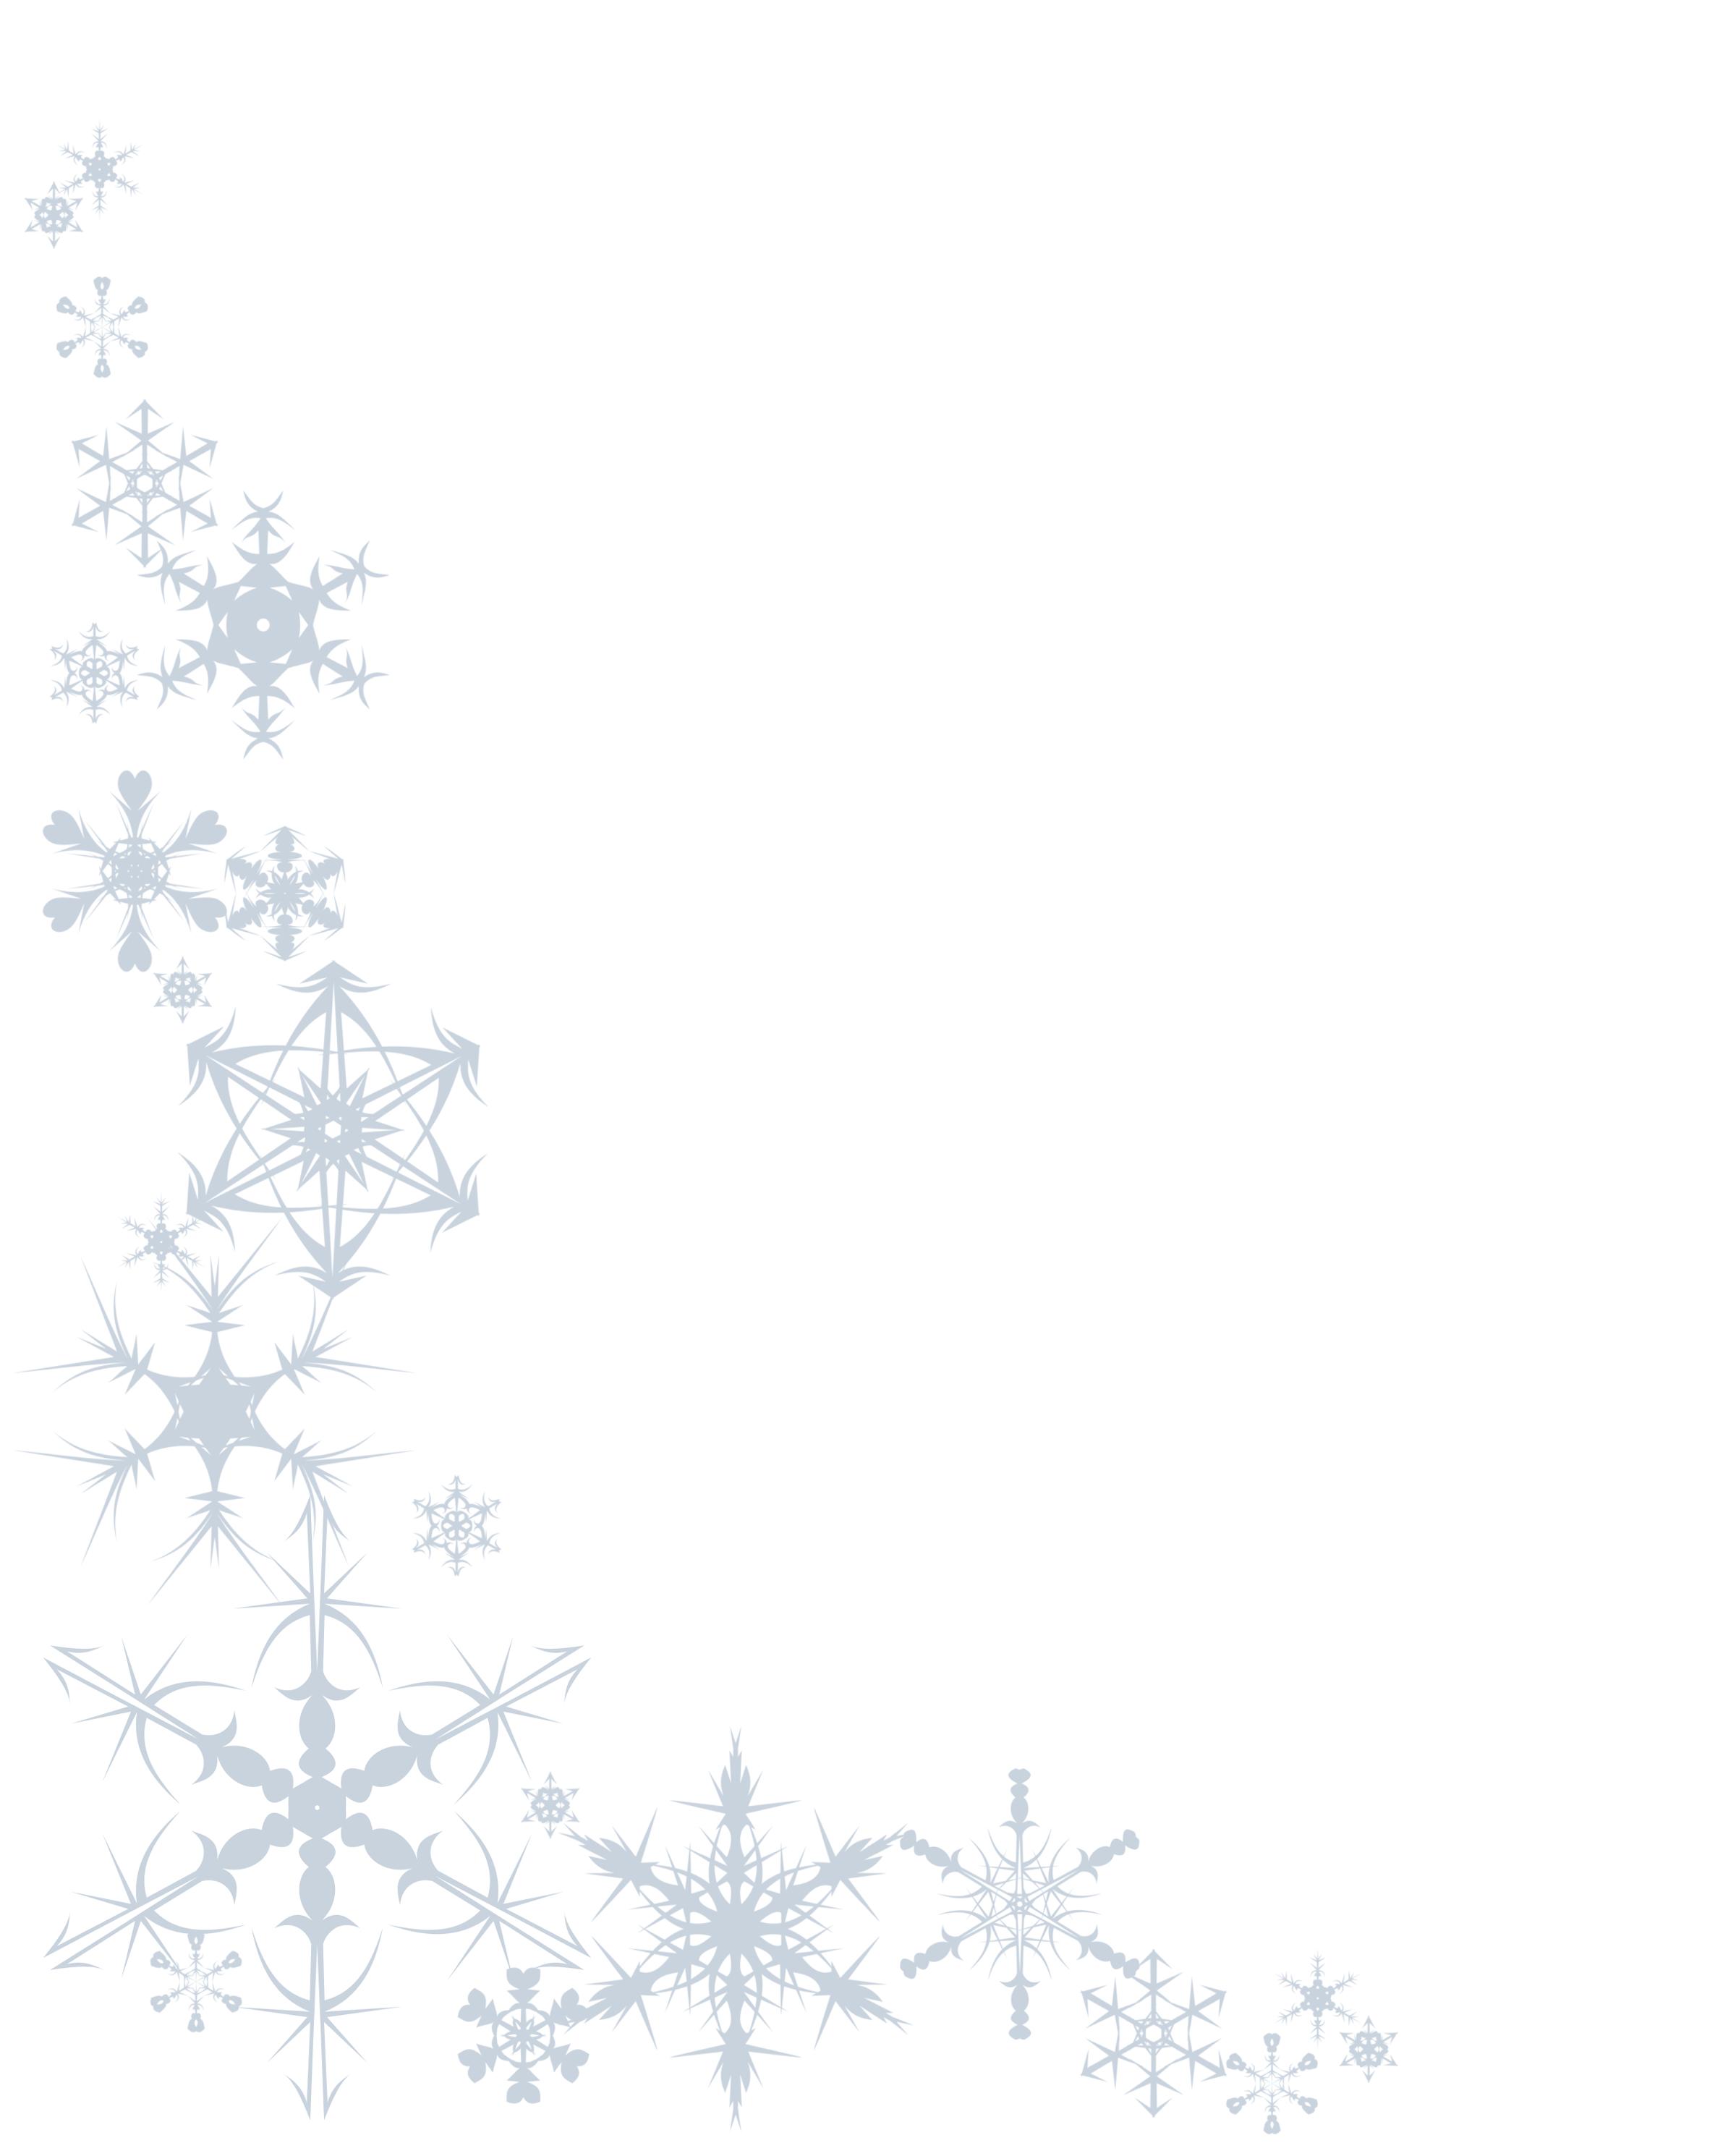 Snowflakepaper8x10 Png 2400 2980 Free Christmas Borders Christmas Stationary Christmas Border